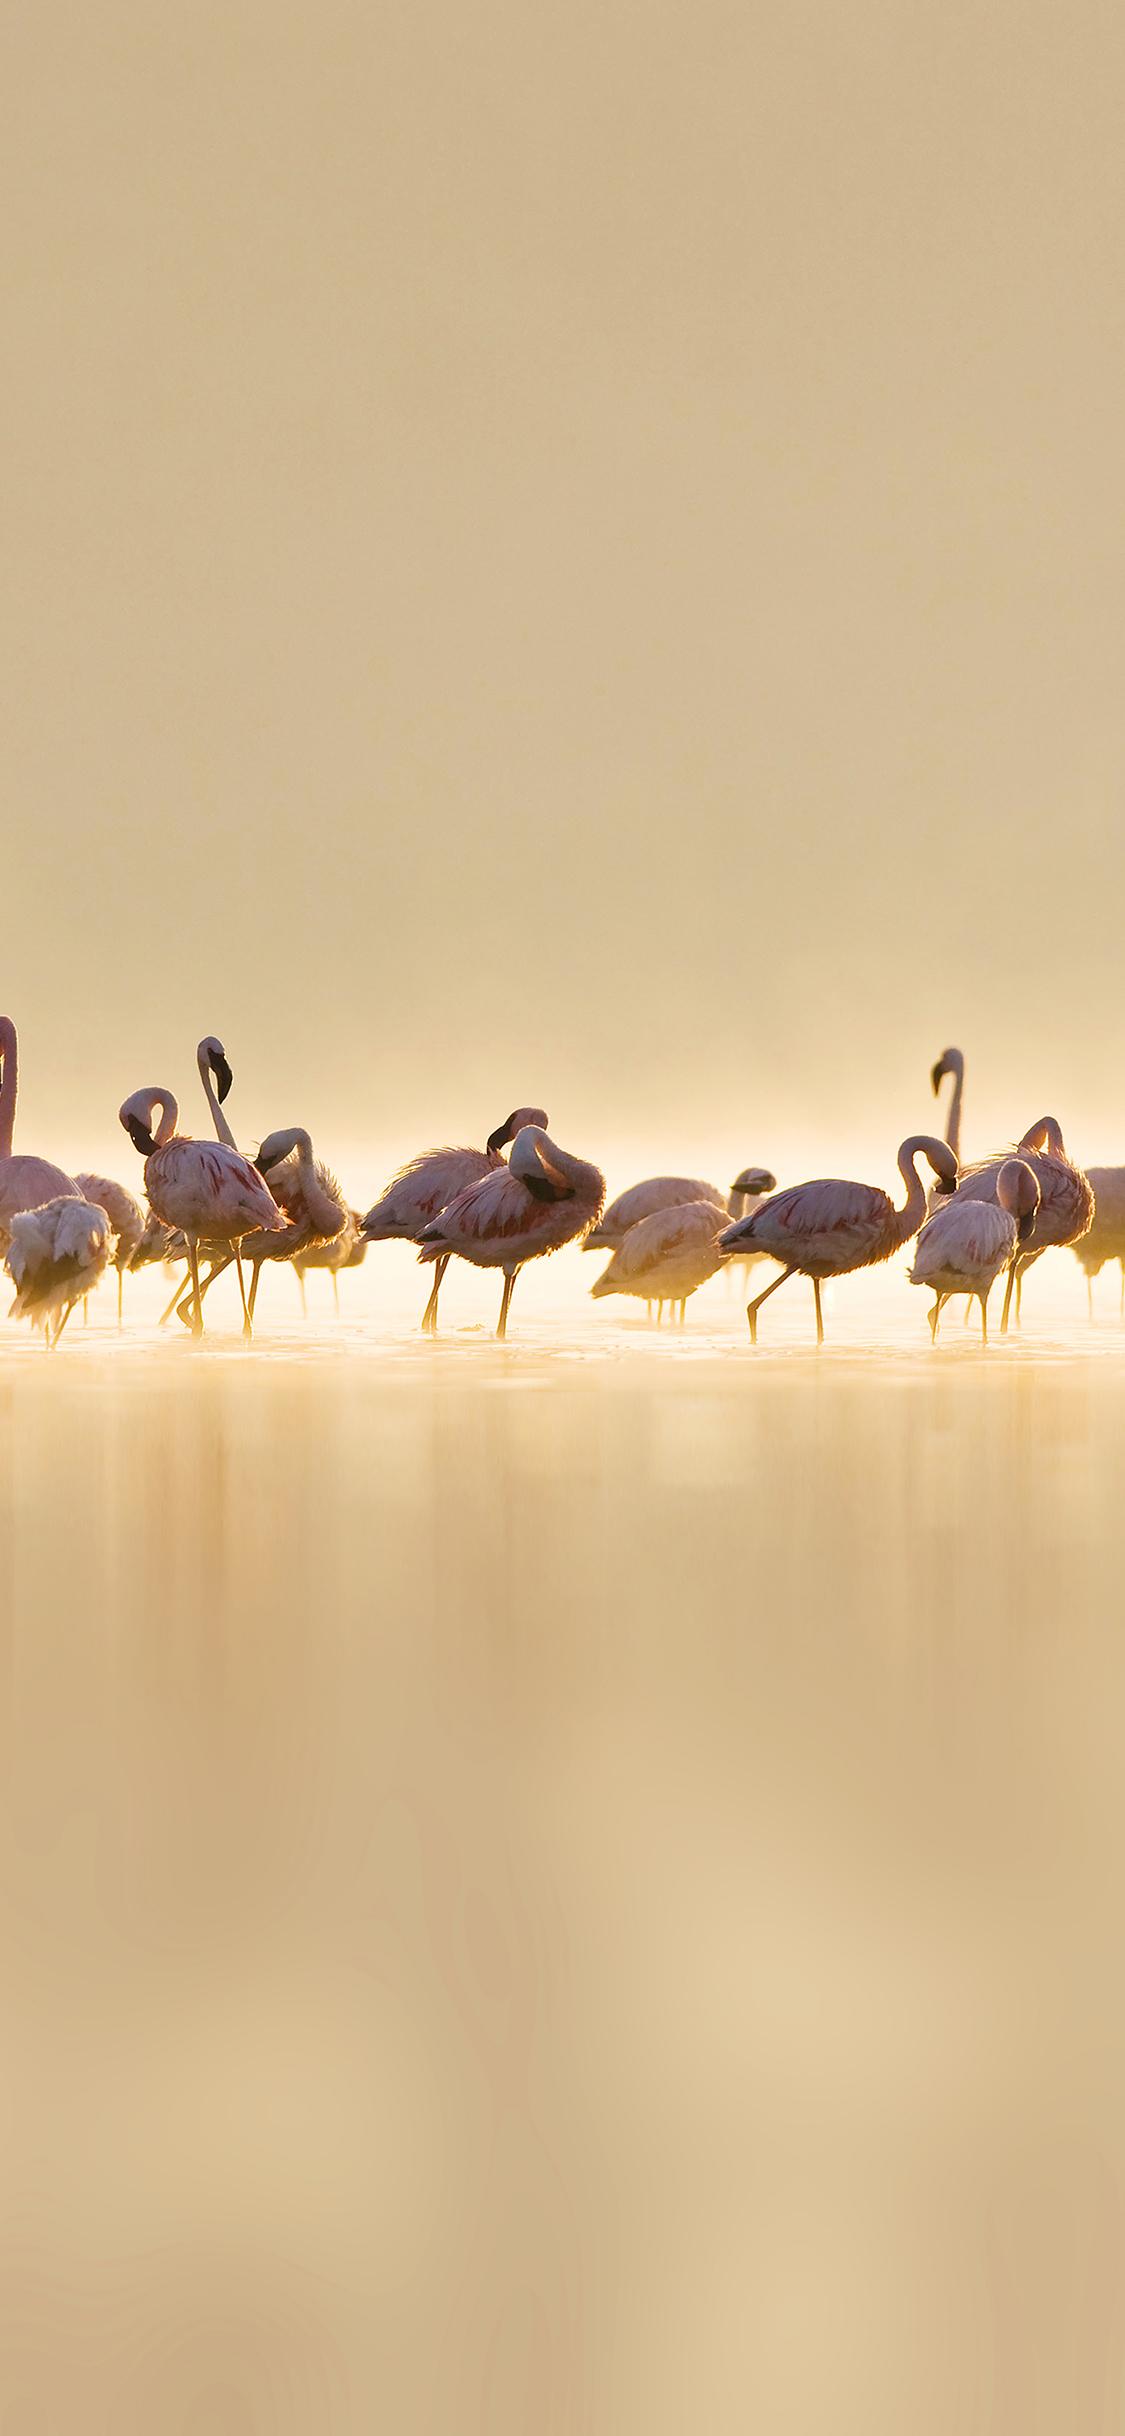 iPhoneXpapers.com-Apple-iPhone-wallpaper-me79-flamingos-peace-animal-nature-birds